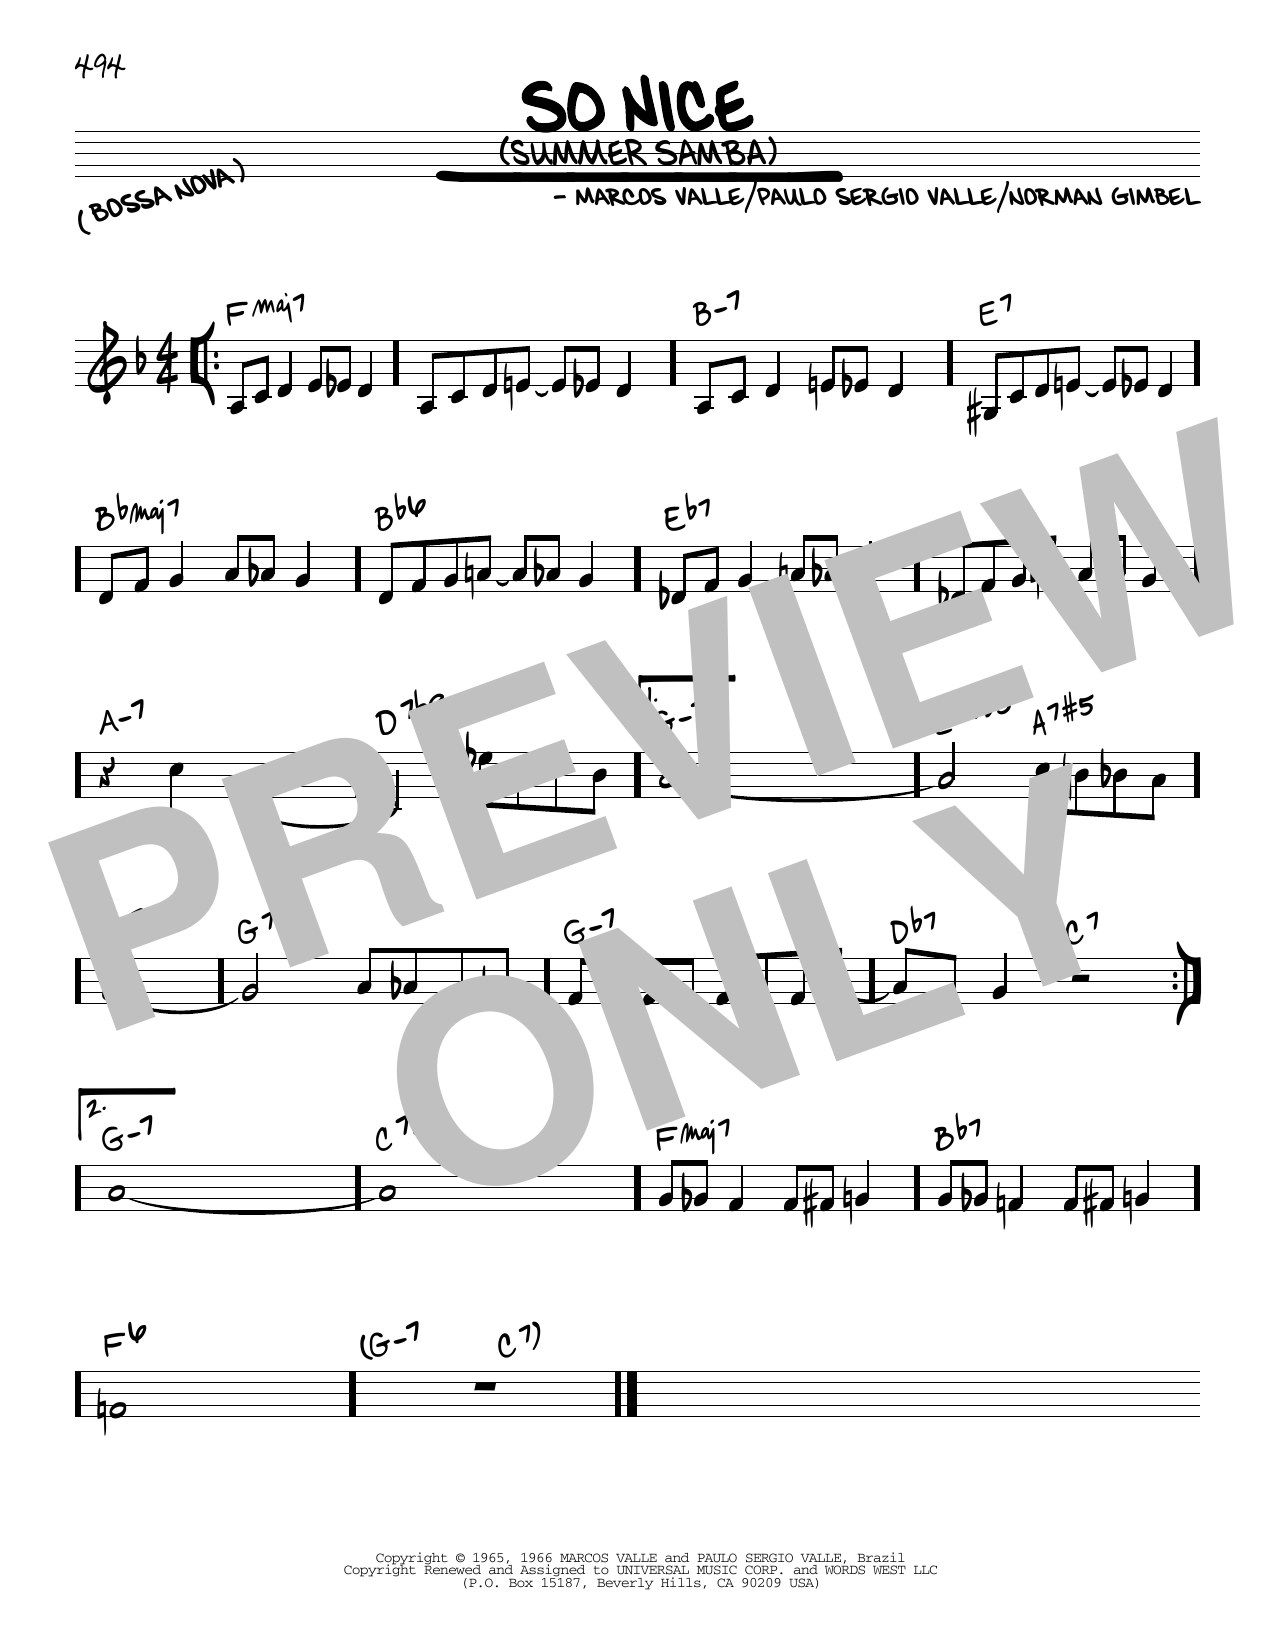 Partition autre So Nice (Summer Samba) de Norman Gimbel - Real Book, Melodie et Accords, Inst. En Do